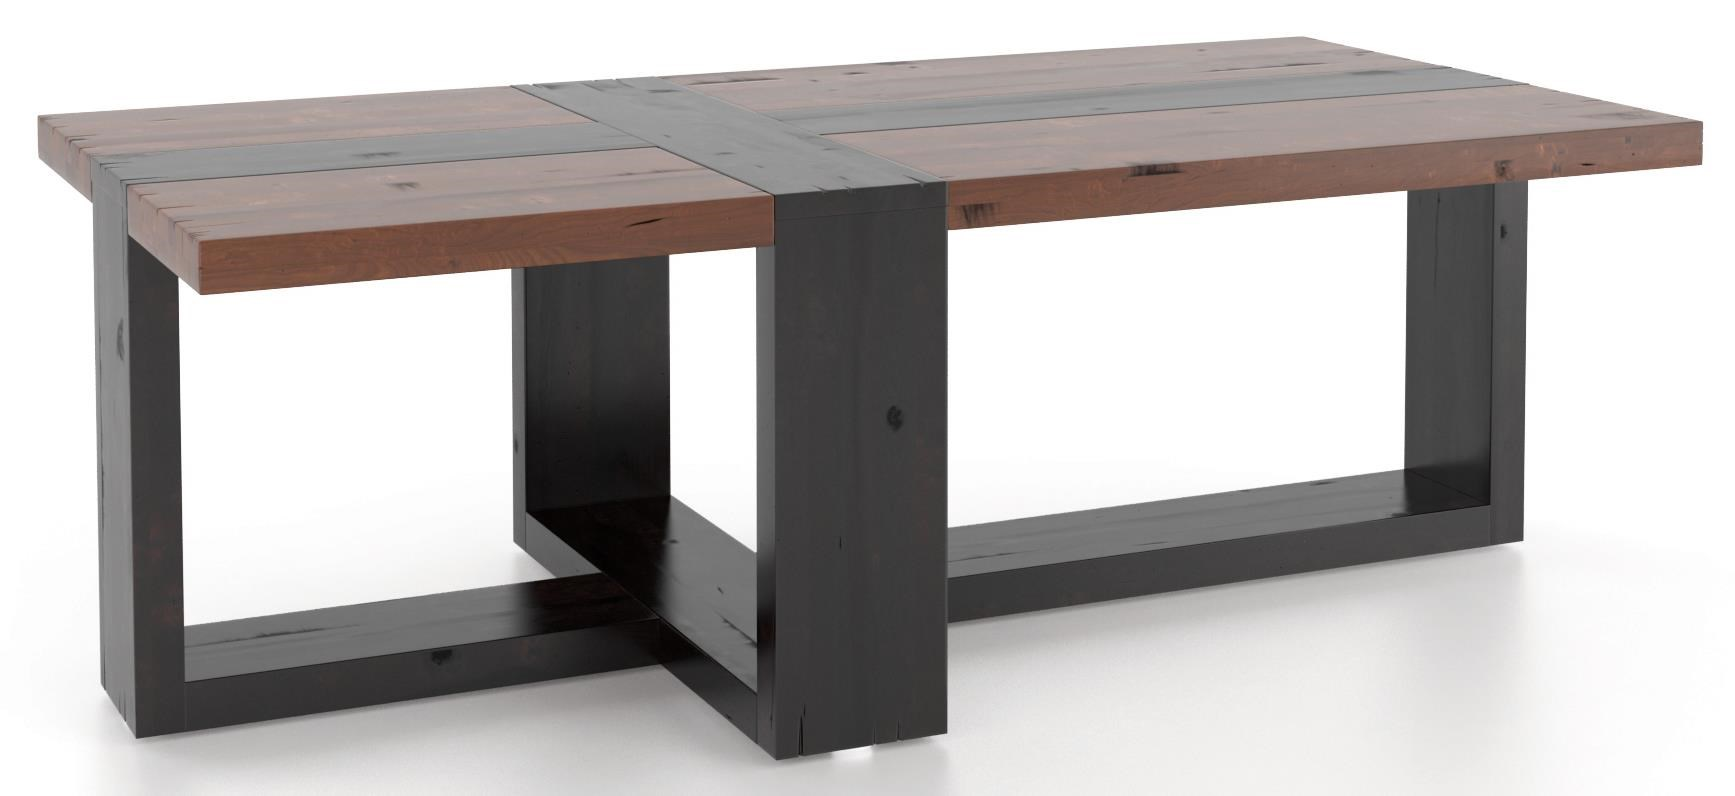 Customizable Rectangular Coffee Table